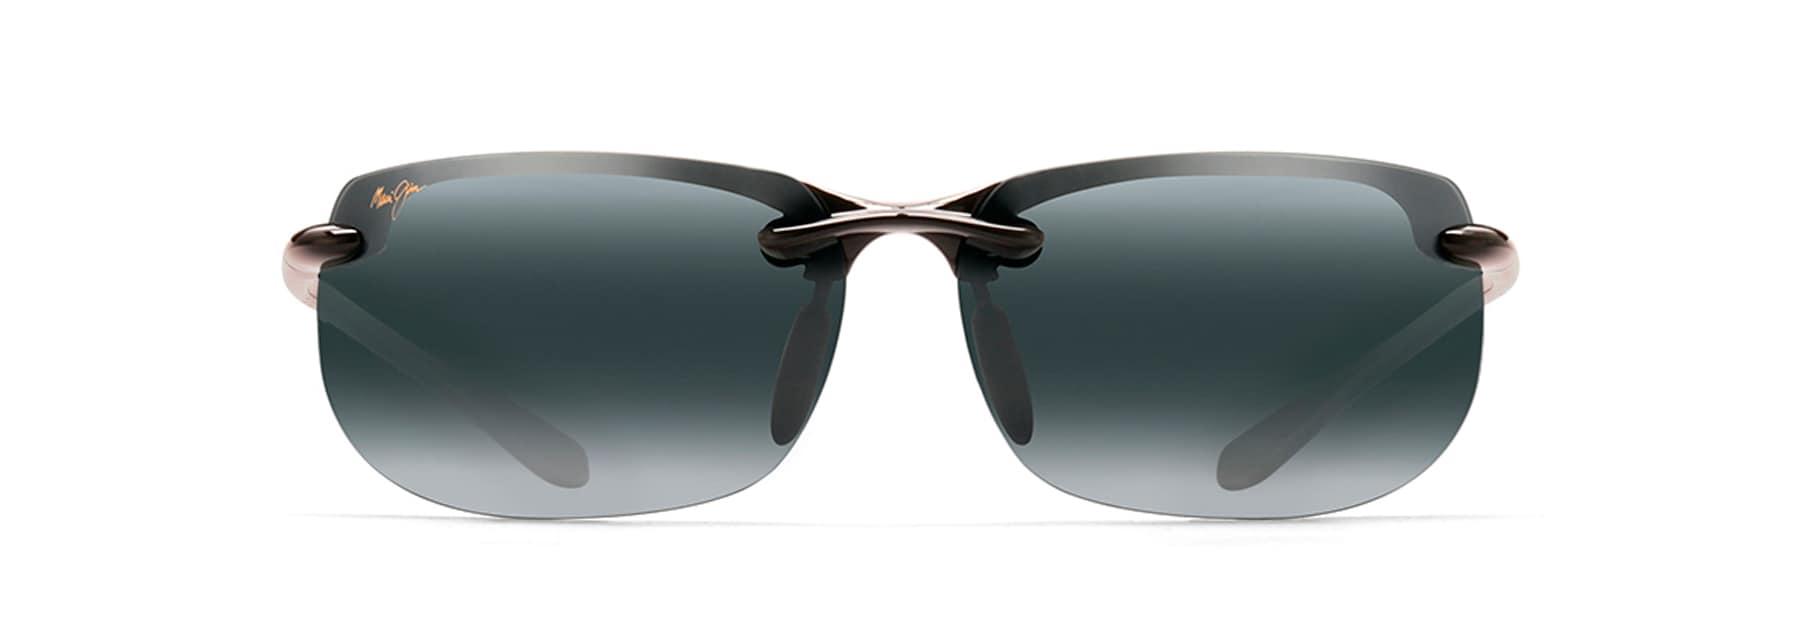 70a79412c8 Banyans Polarized Sunglasses | Maui Jim®